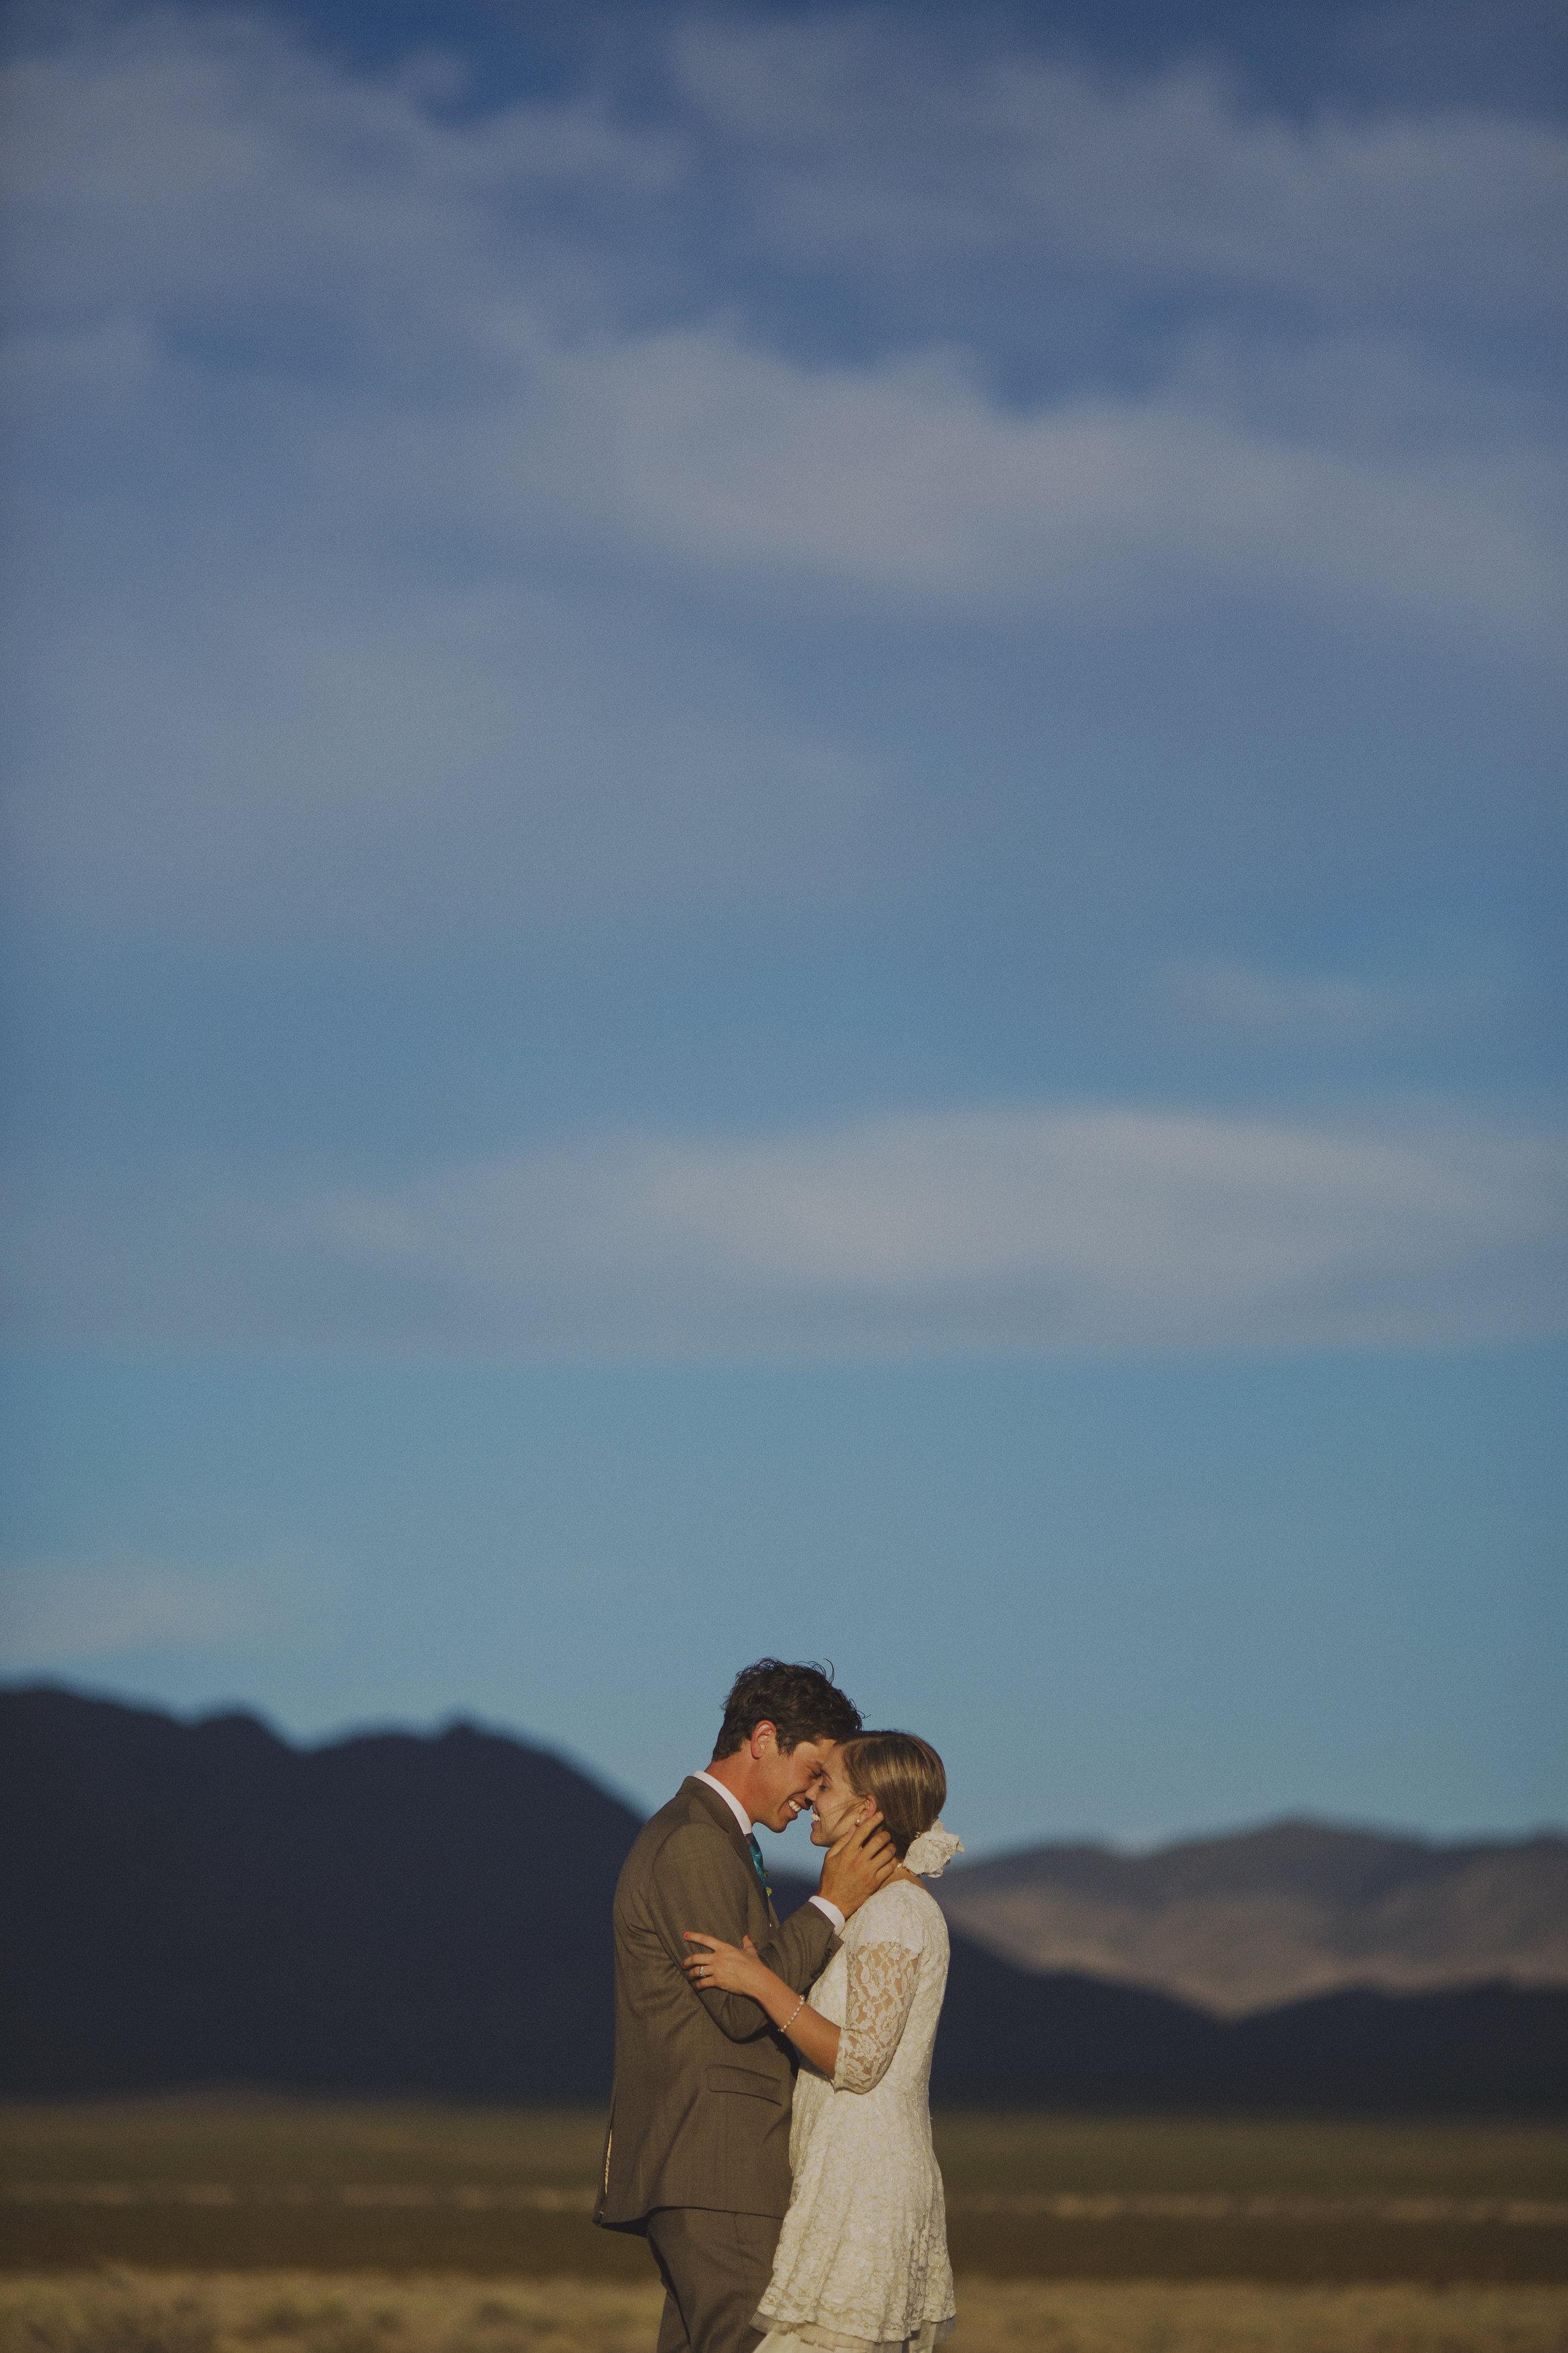 josie_brighton_weddingportraits_08302015.jpg